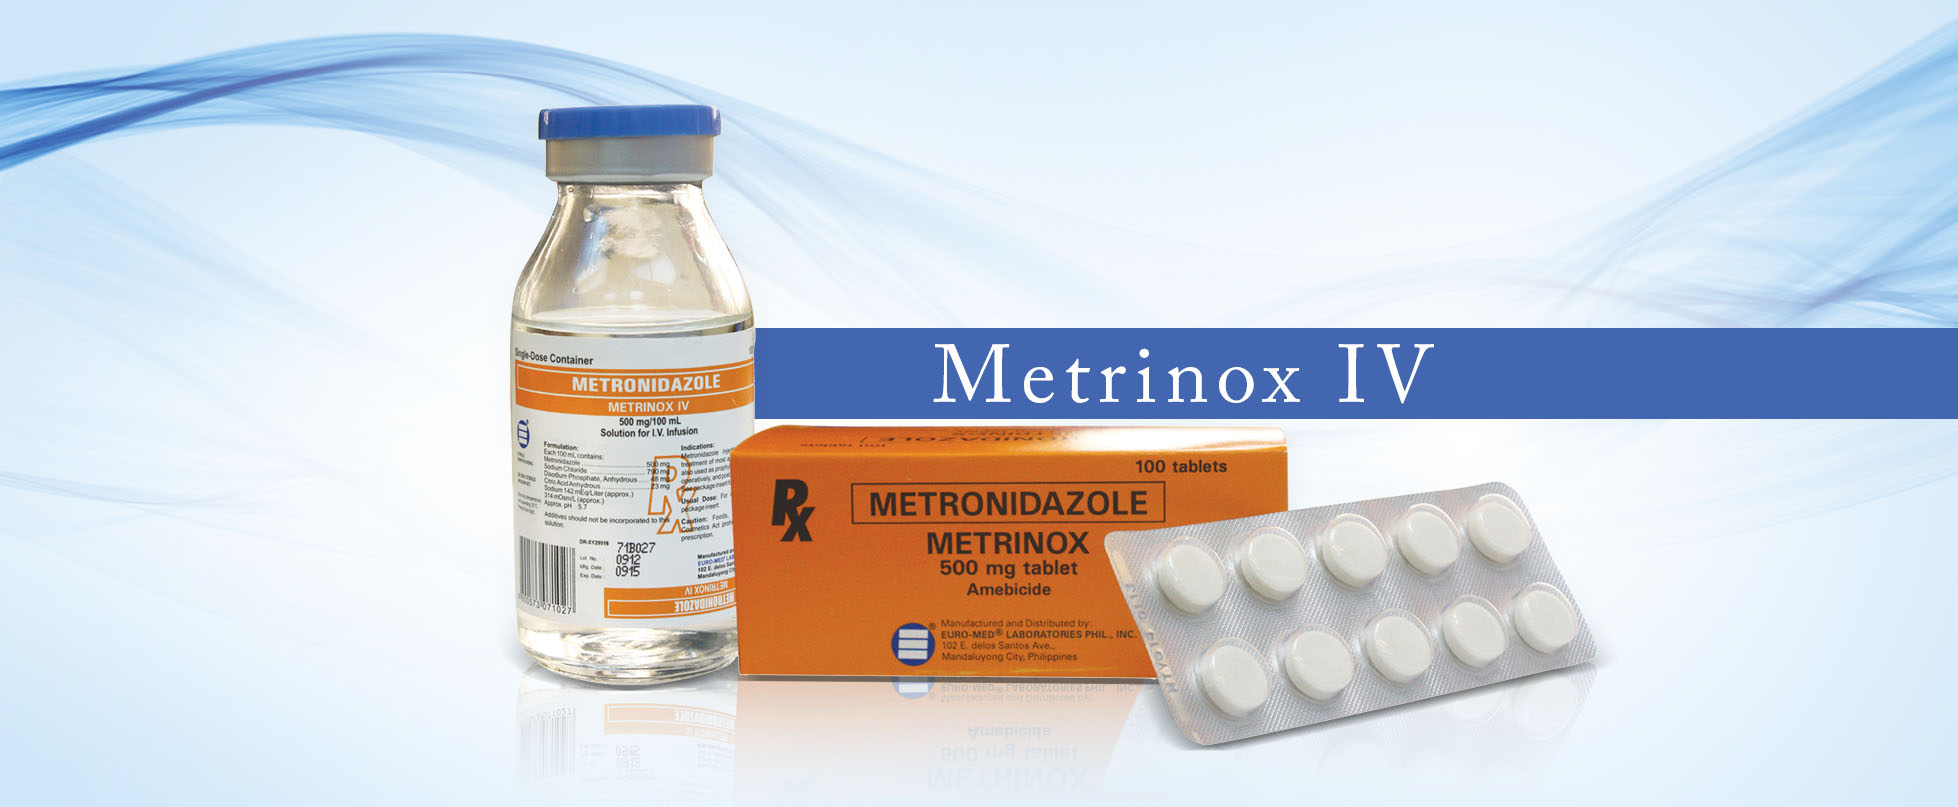 Metrinox IV